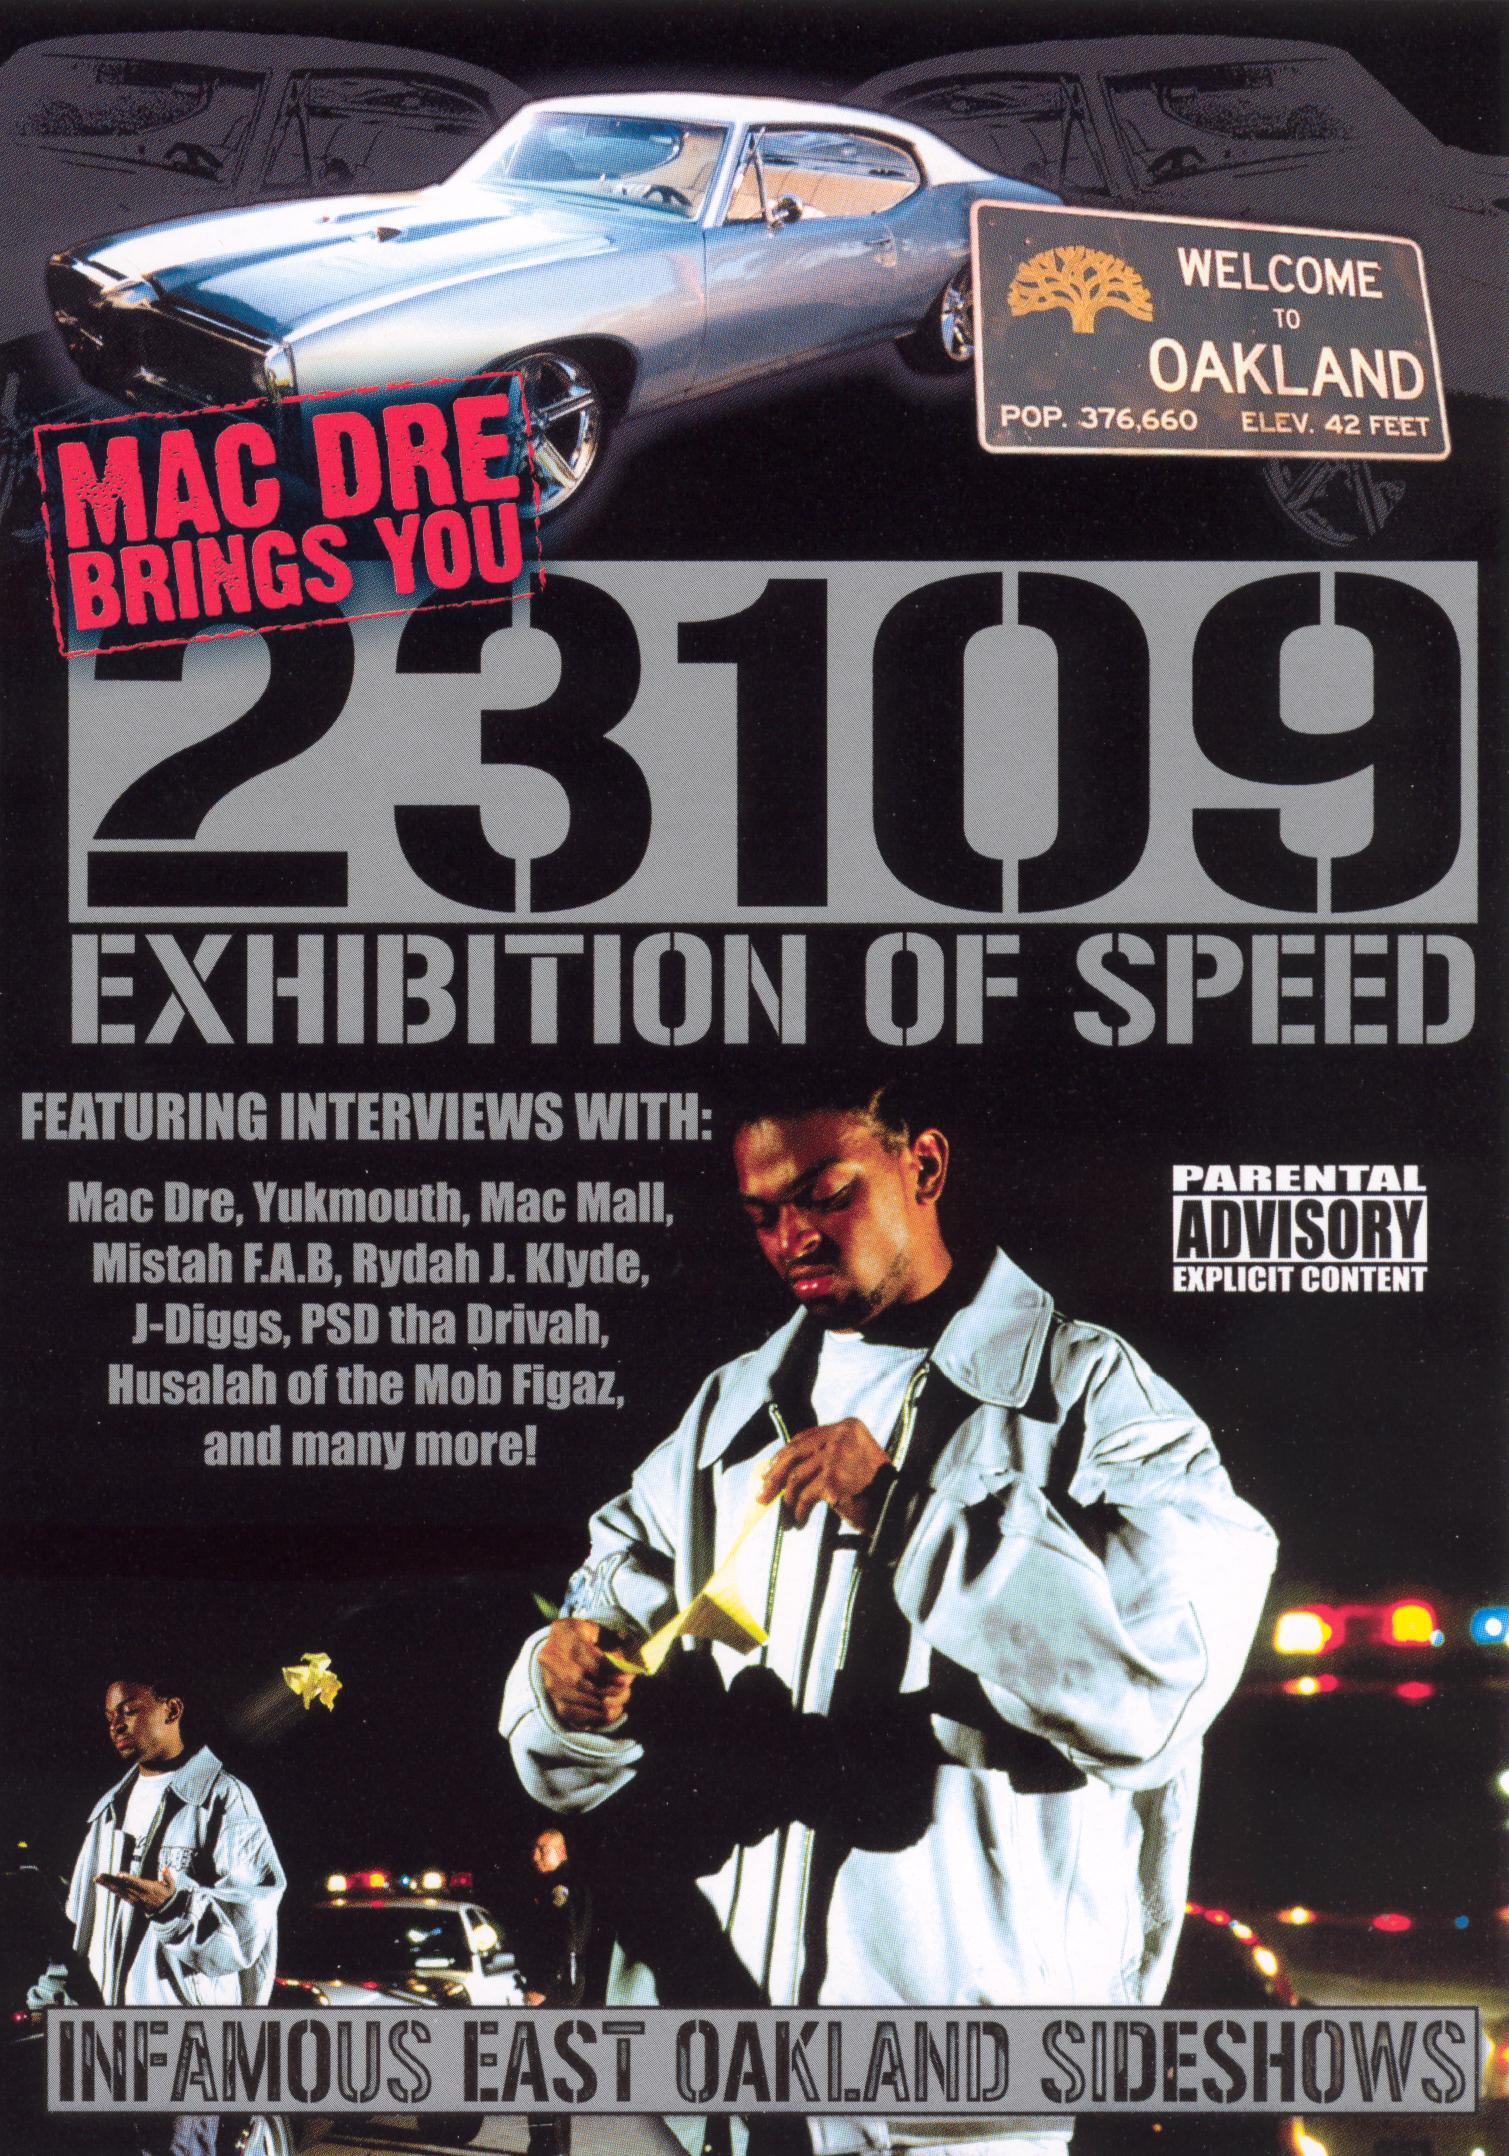 Mac Dre: 23109 - Exhibition of Speed